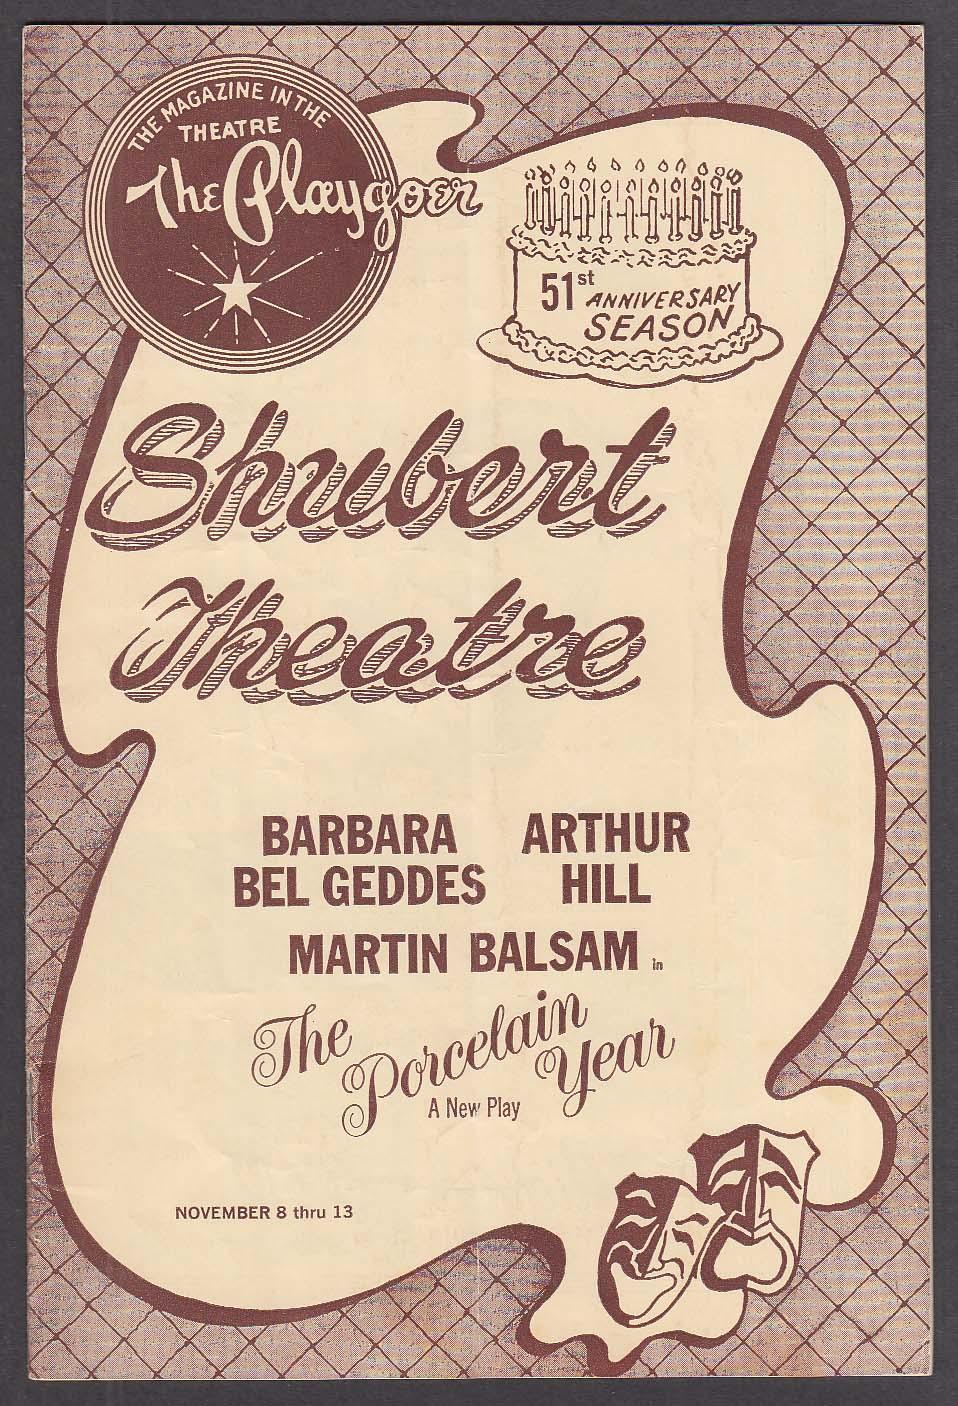 Bel Geddes Porcelain Year World Premiere Shubert Theatre program 1966